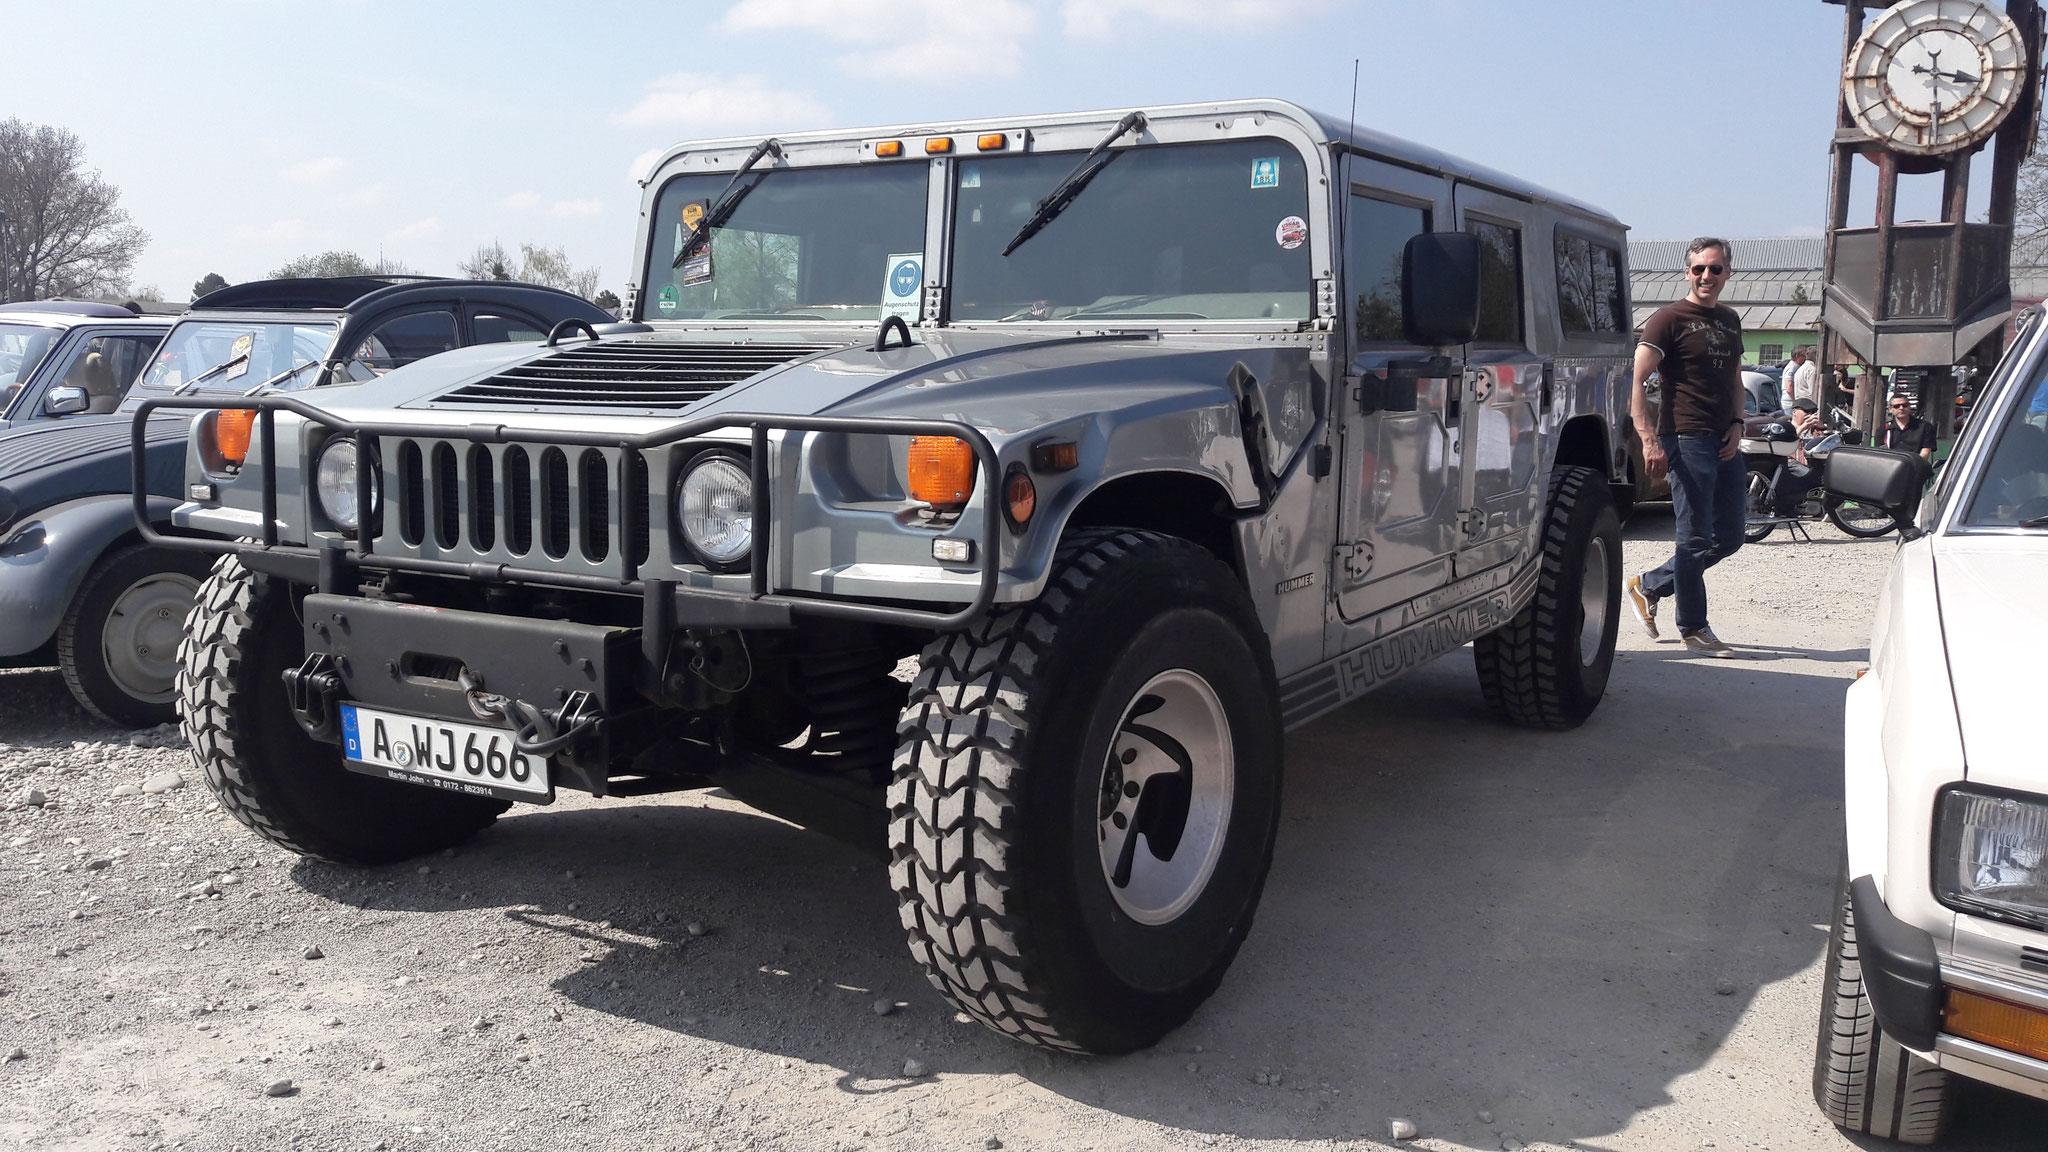 Hummer H1 - A-WJ-666